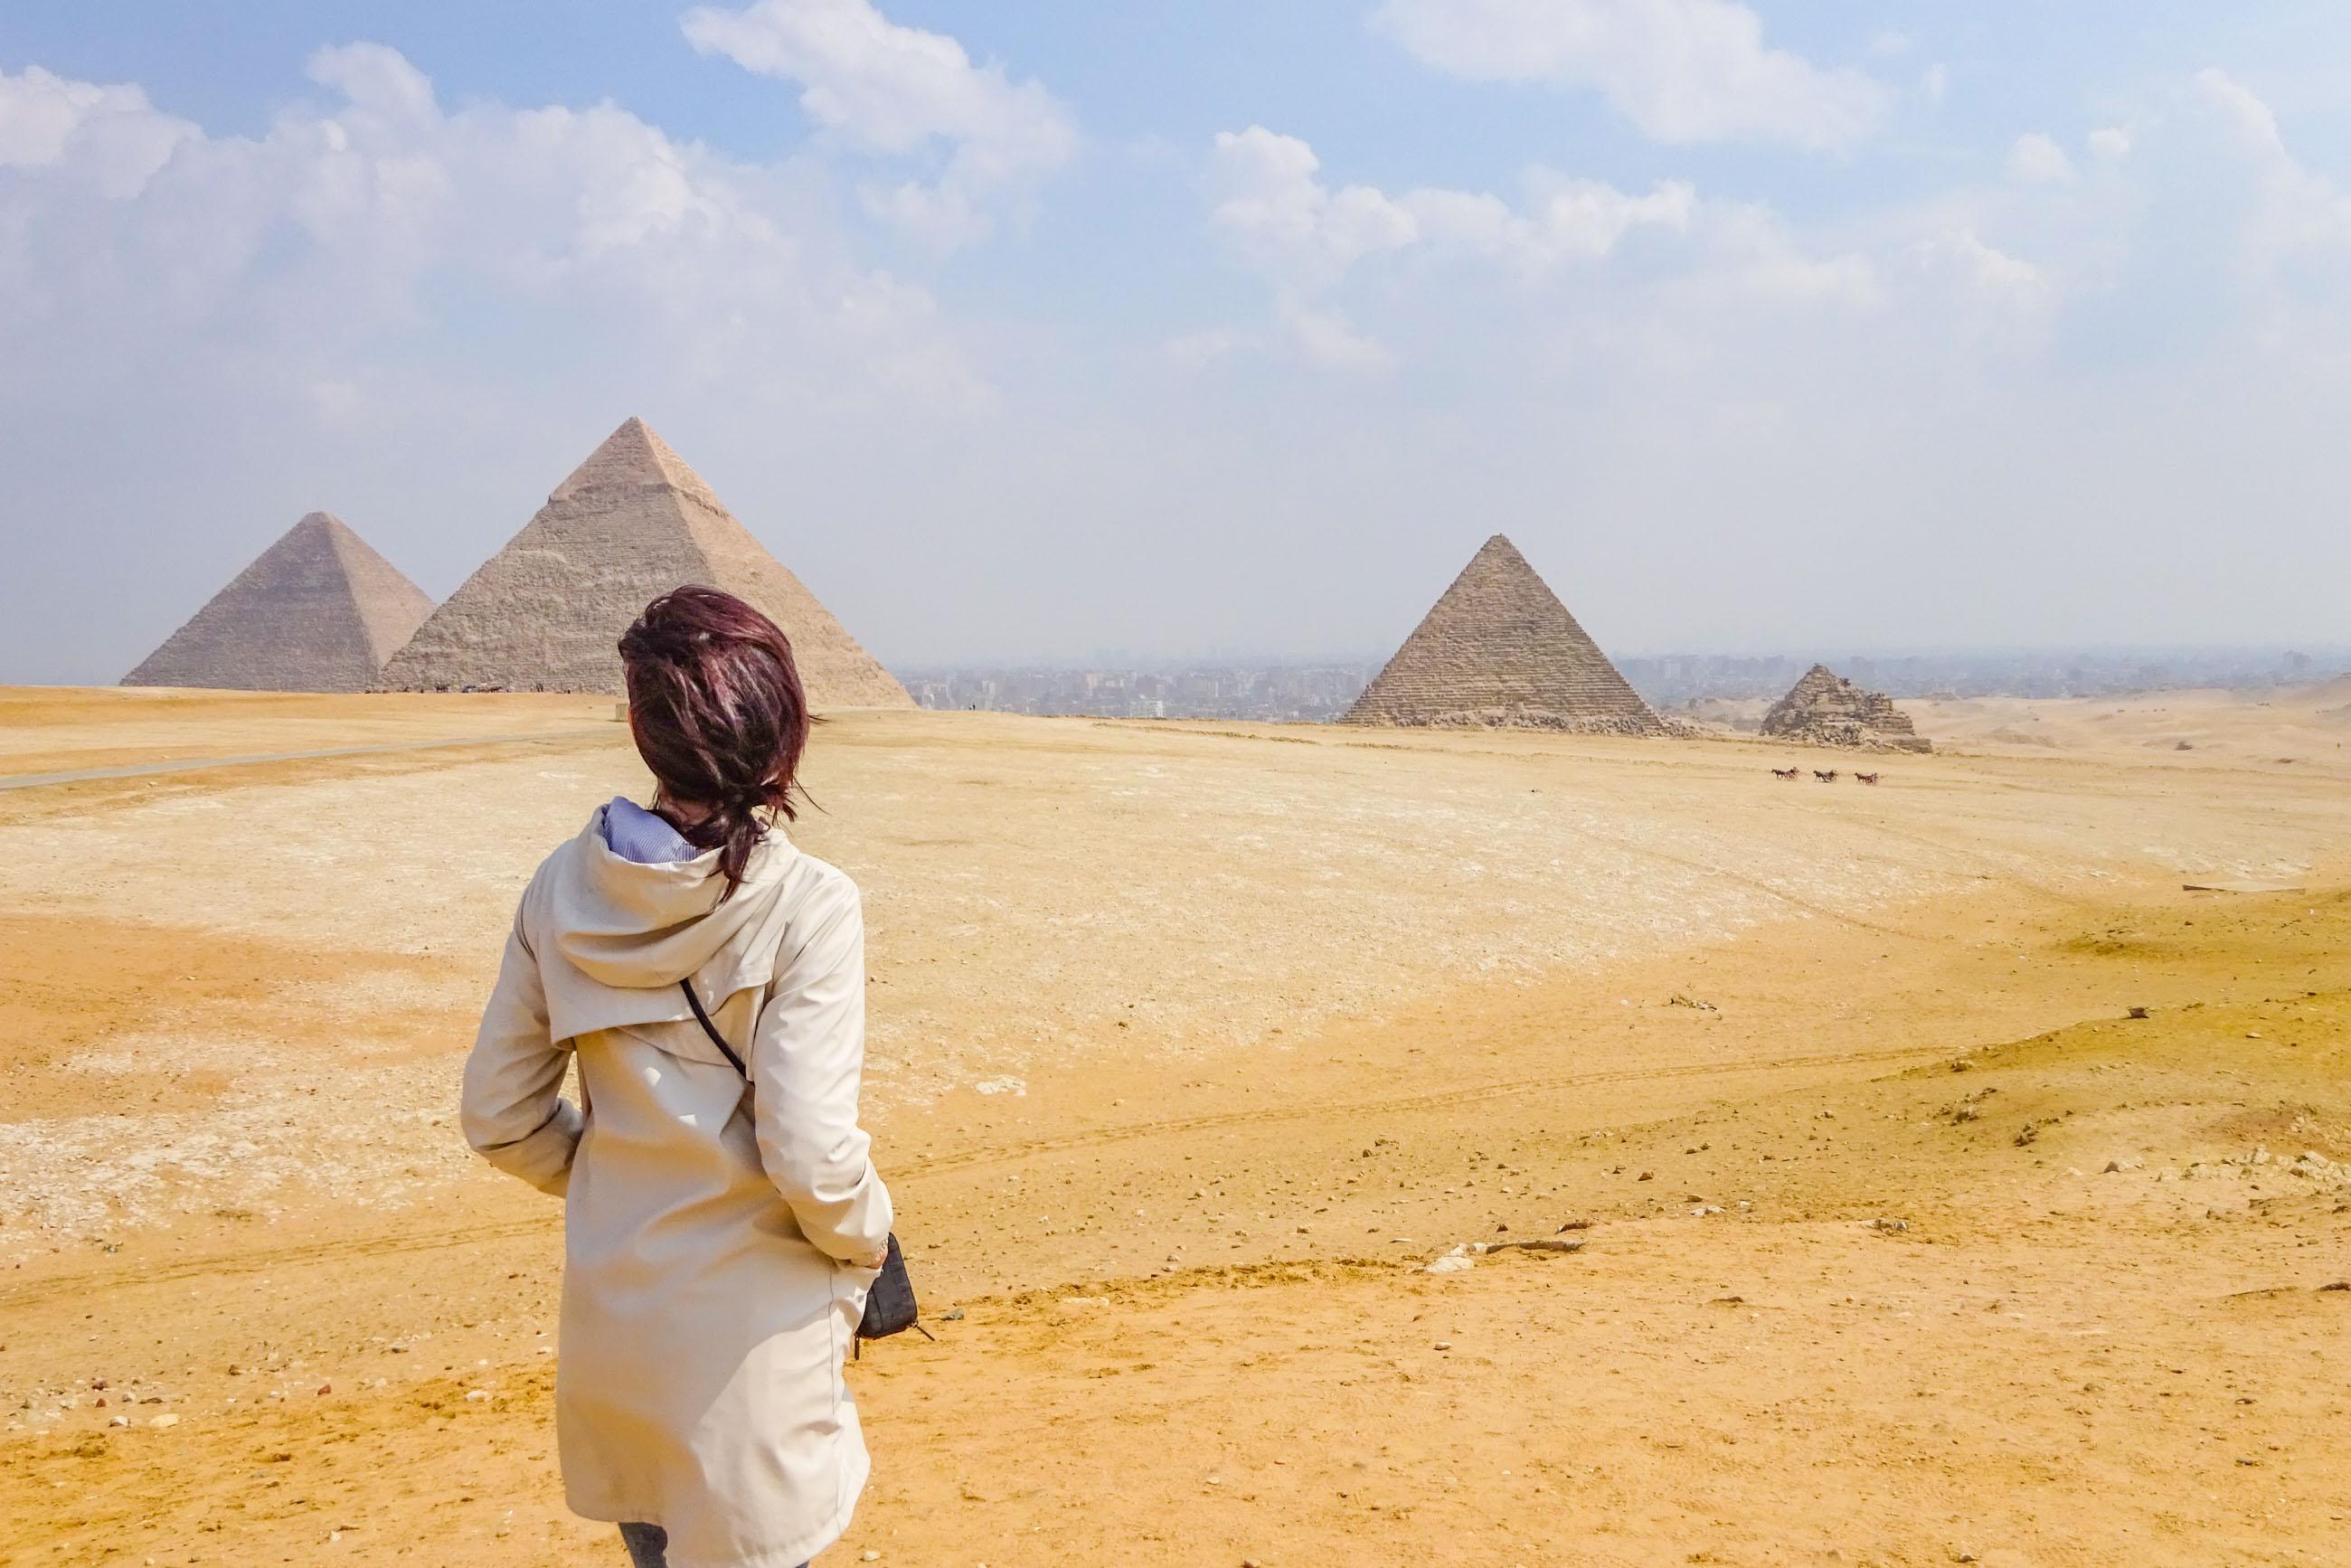 https://bubo.sk/uploads/galleries/17820/miroslavadlha_egypt_kahira-37-.jpg